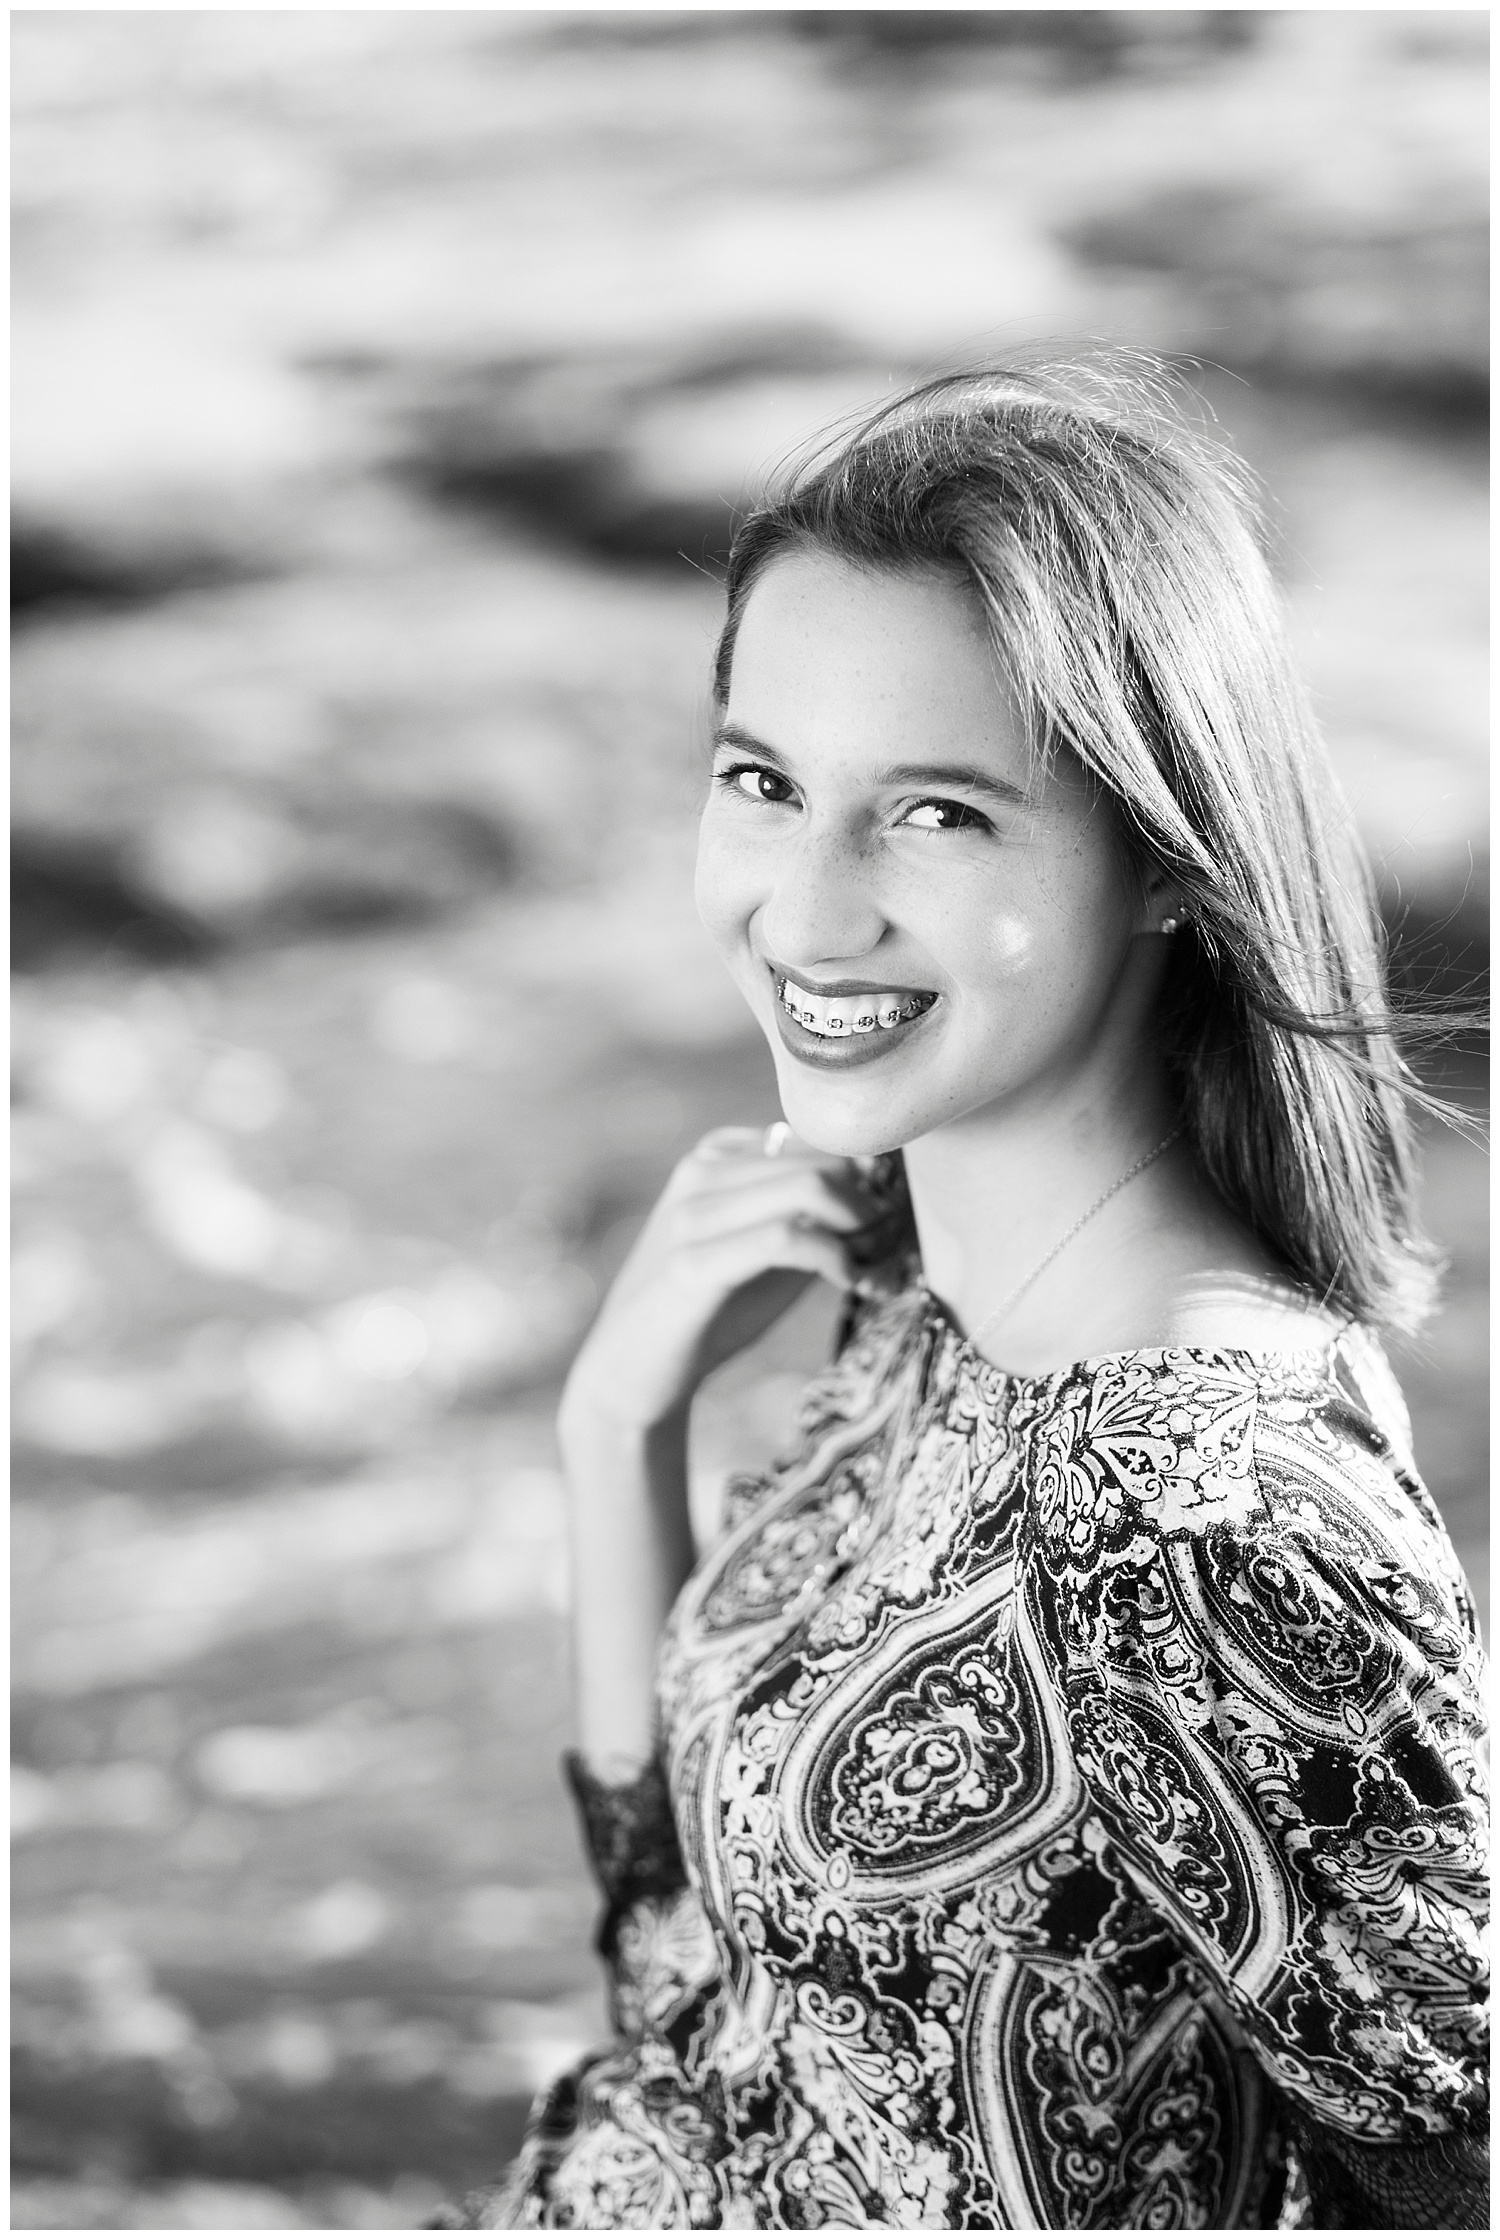 08292017_MayaH_High School Senior Photography_Renoda Campbell Photography-8354.jpg